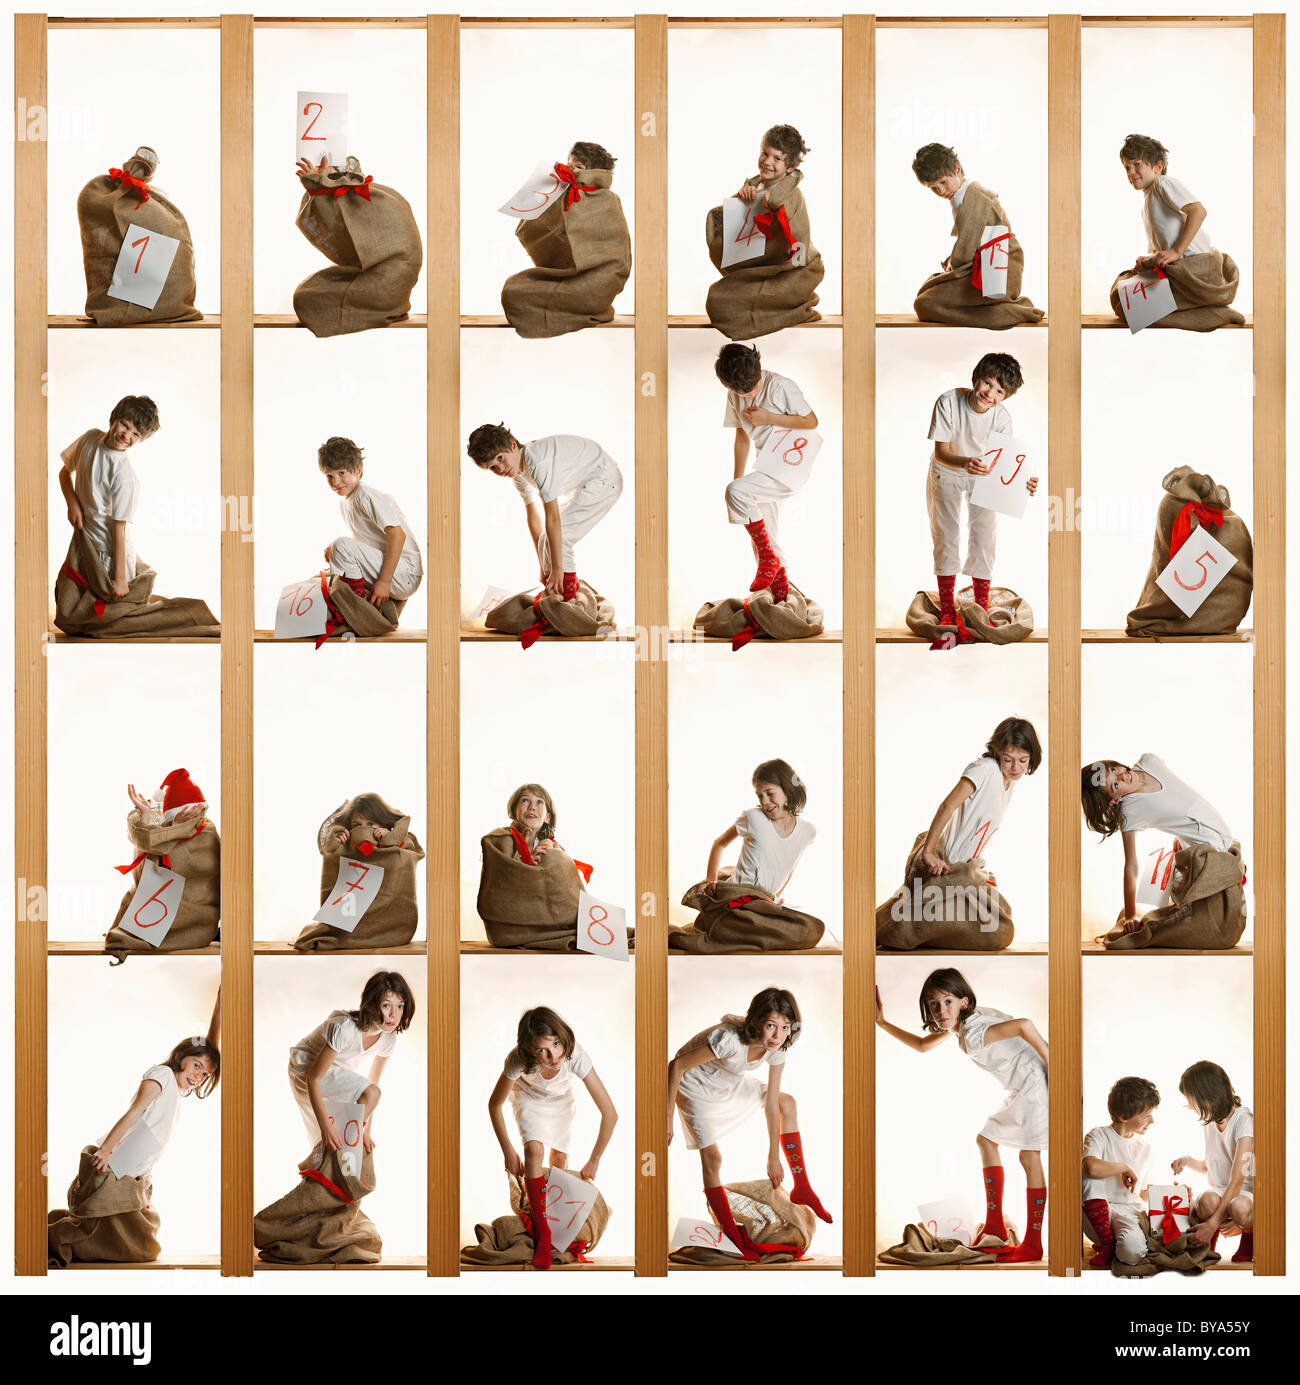 Advent calendar with children - Stock Image